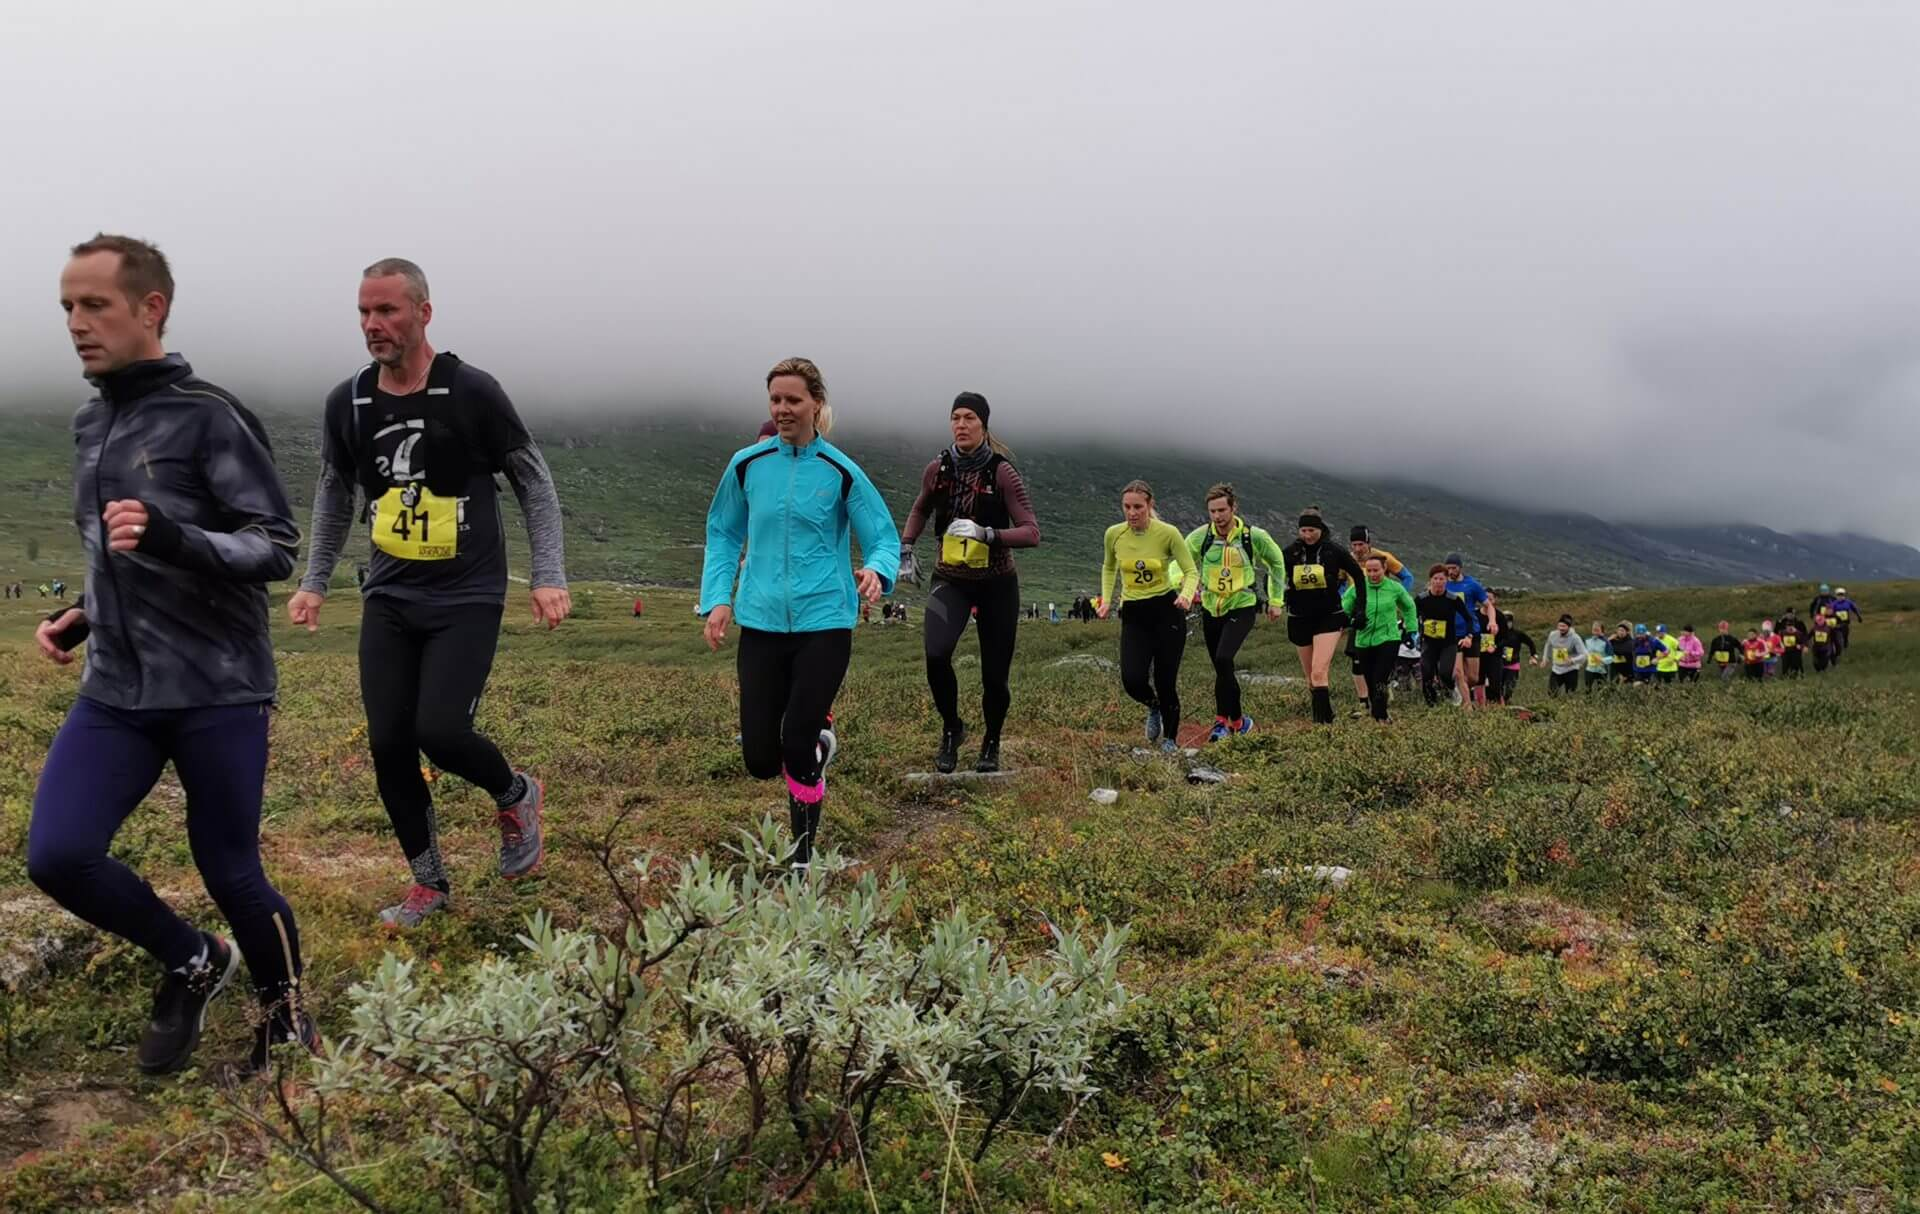 Arctic Circle Race 2019 Polcirkelloppet Guijaure start 11